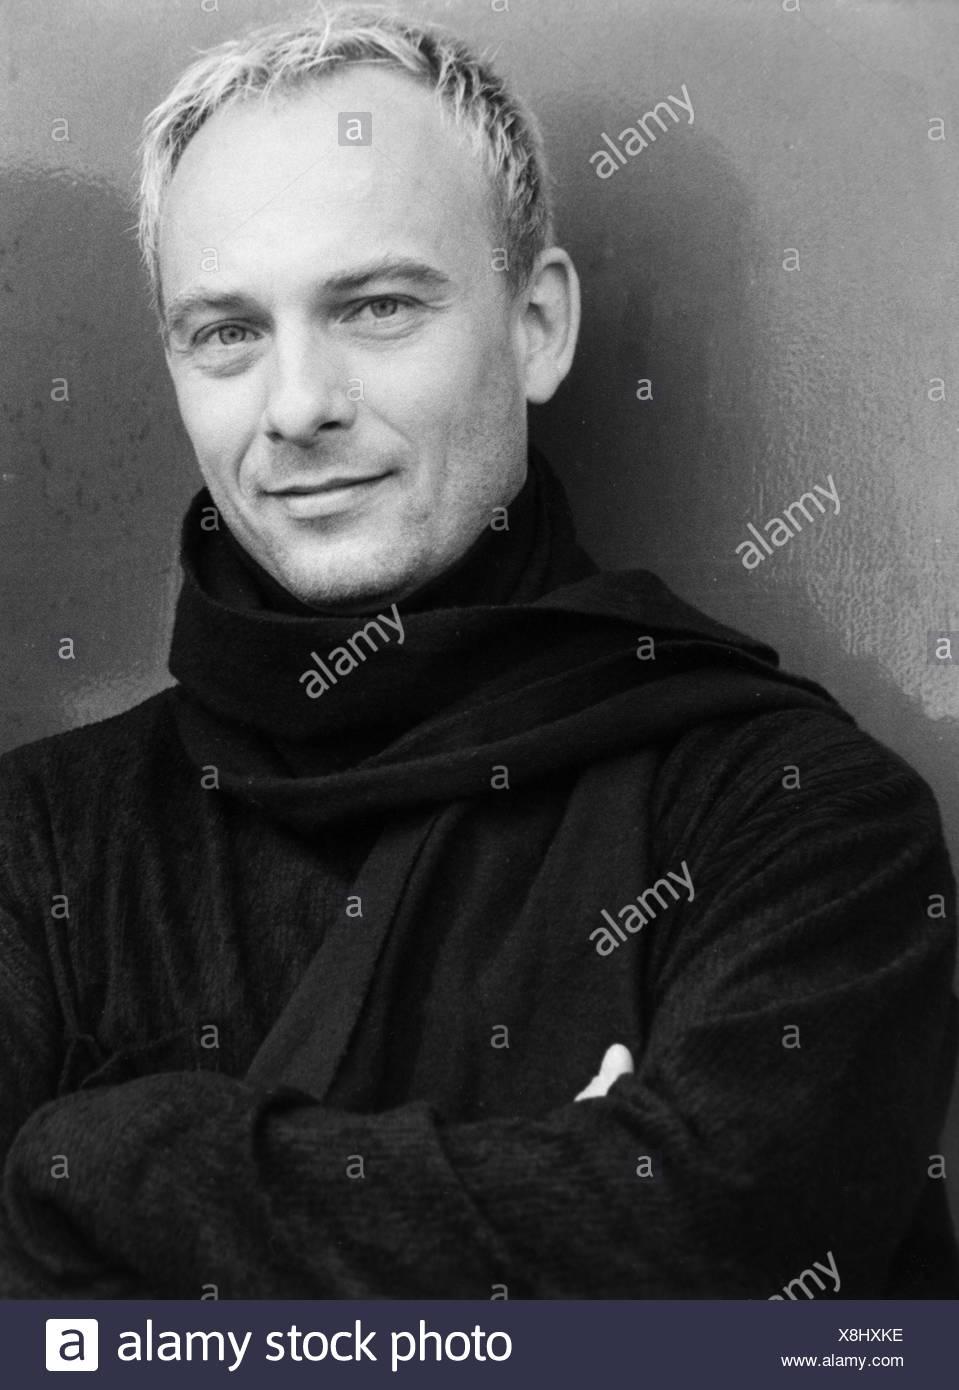 Fessler, Peter, músico alemán (cantante), retrato, foto llamada, Stuttgart, 1998, Additional-Rights-juegos-NA Imagen De Stock